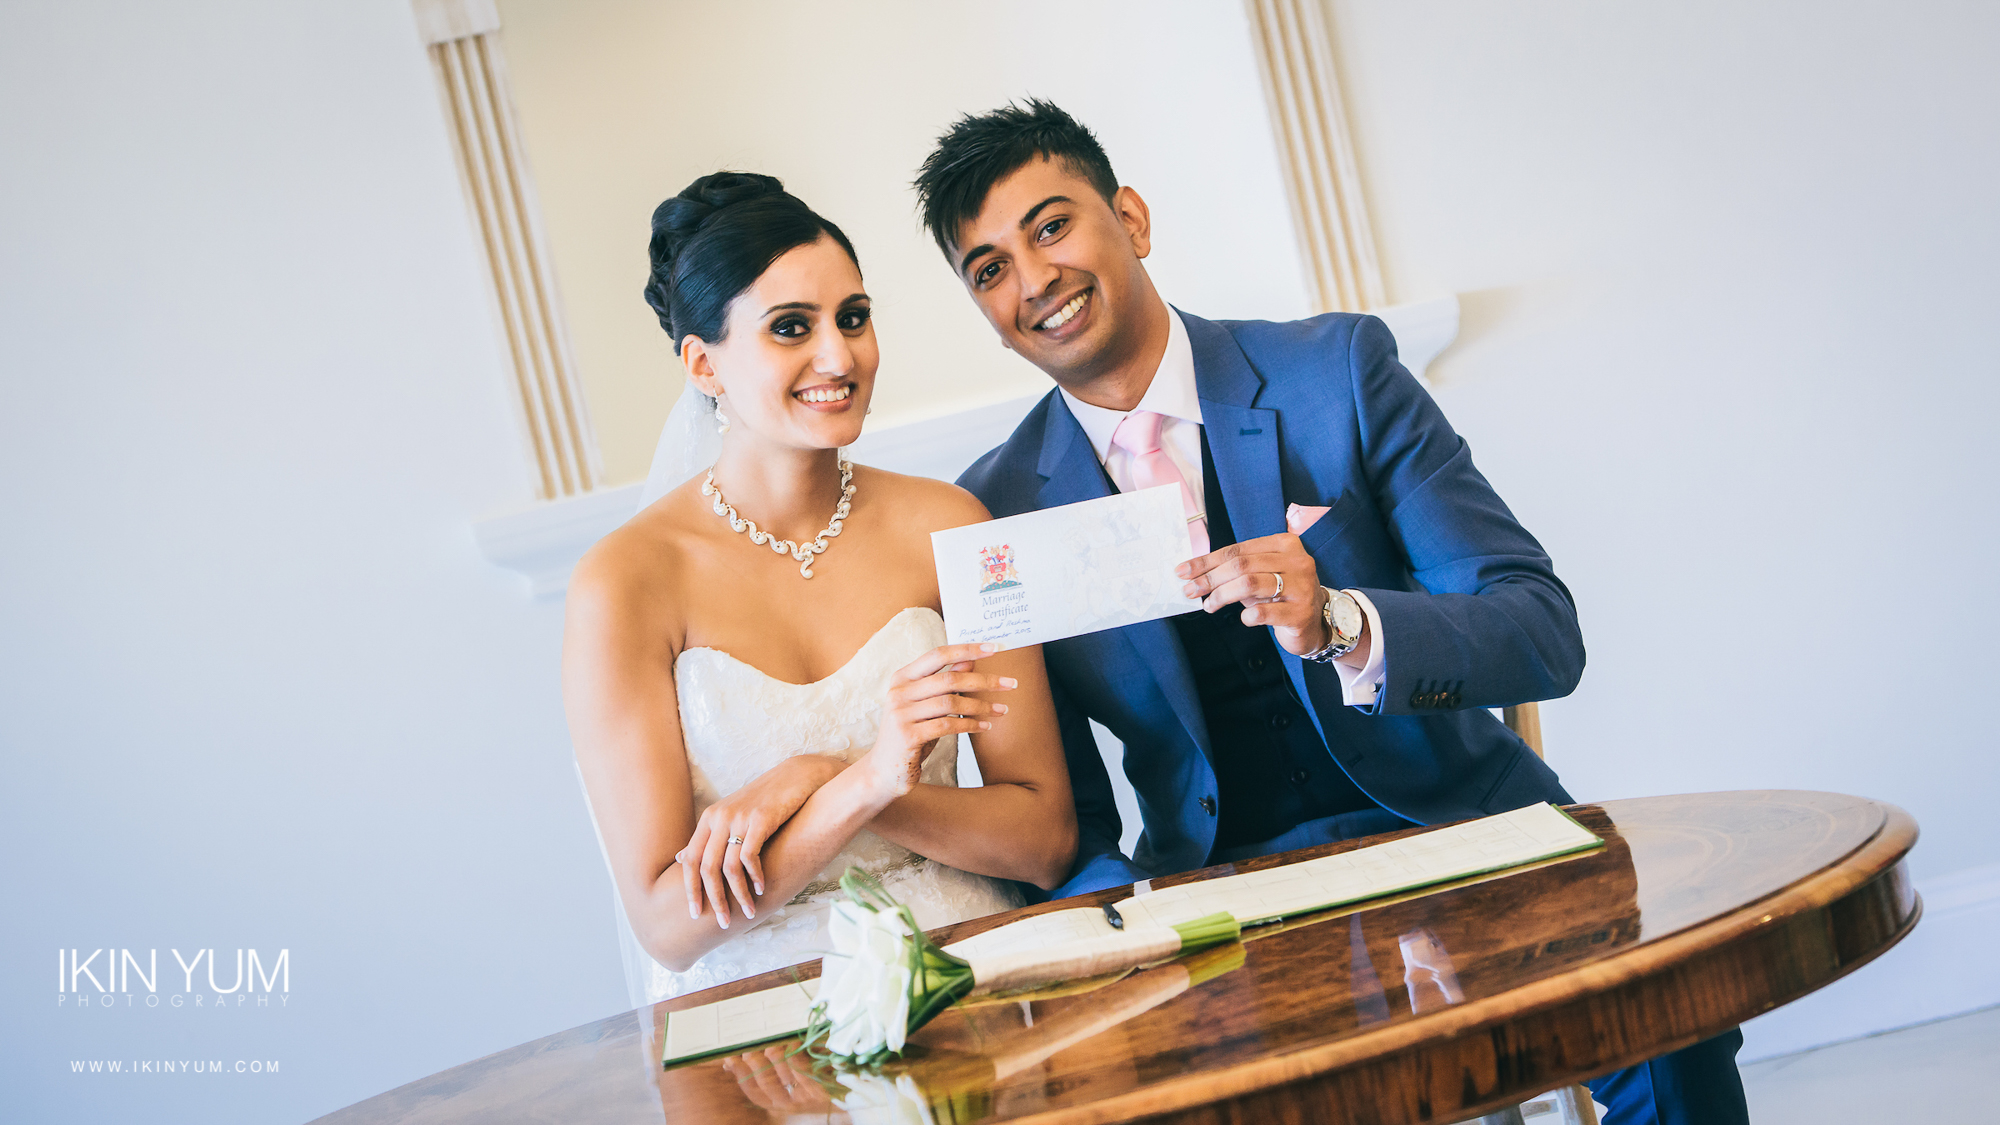 Froyle Park Indian Wedding - Ikin Yum Photography-067.jpg